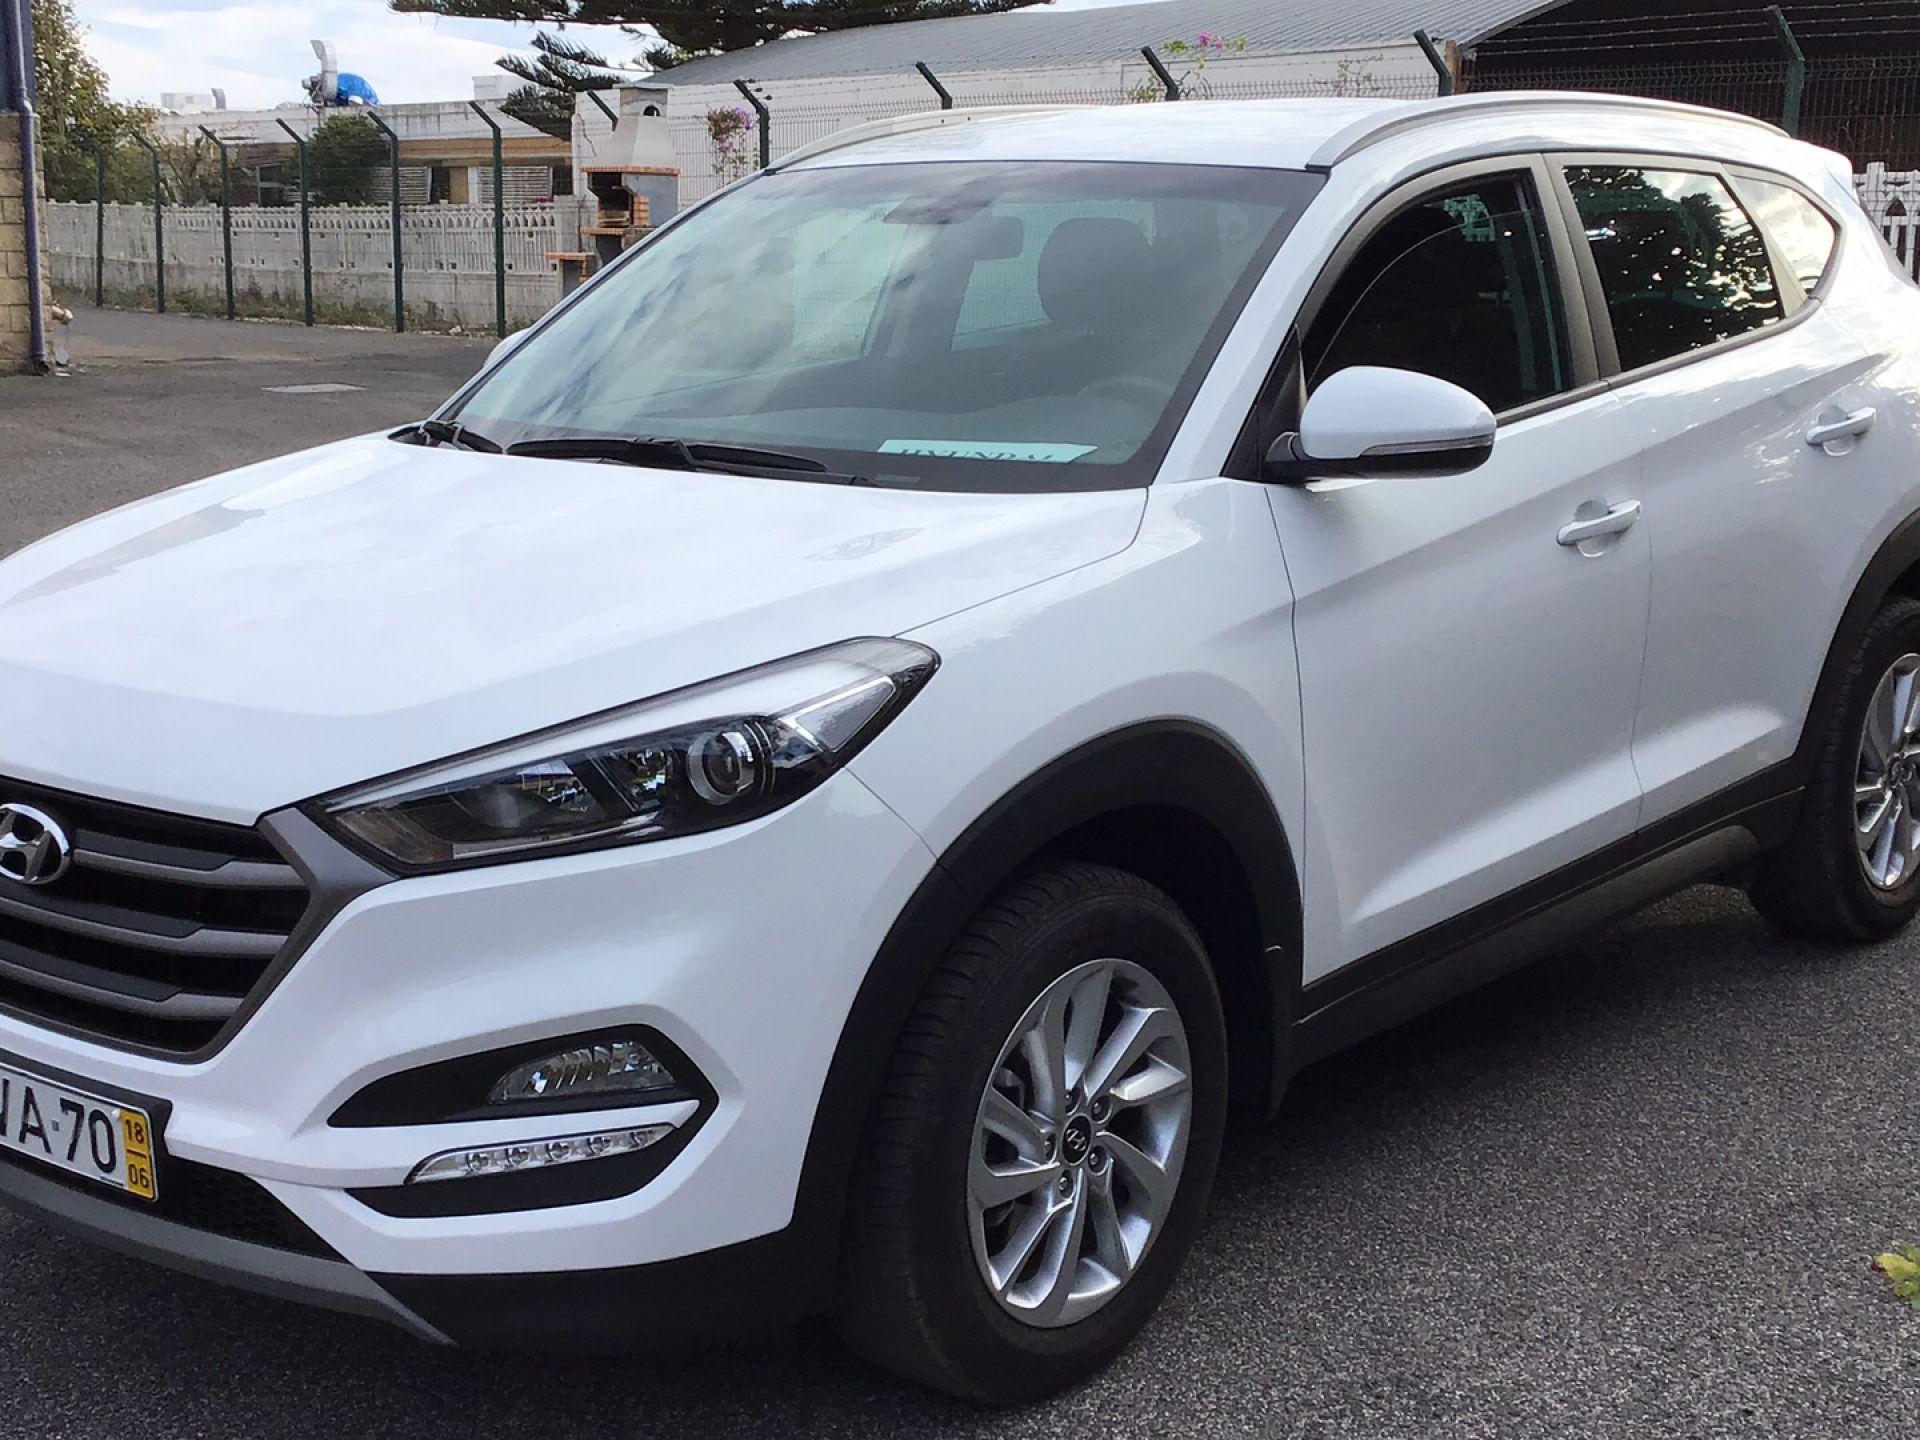 Hyundai Tucson 1.7 CRDi Executive usada Setúbal